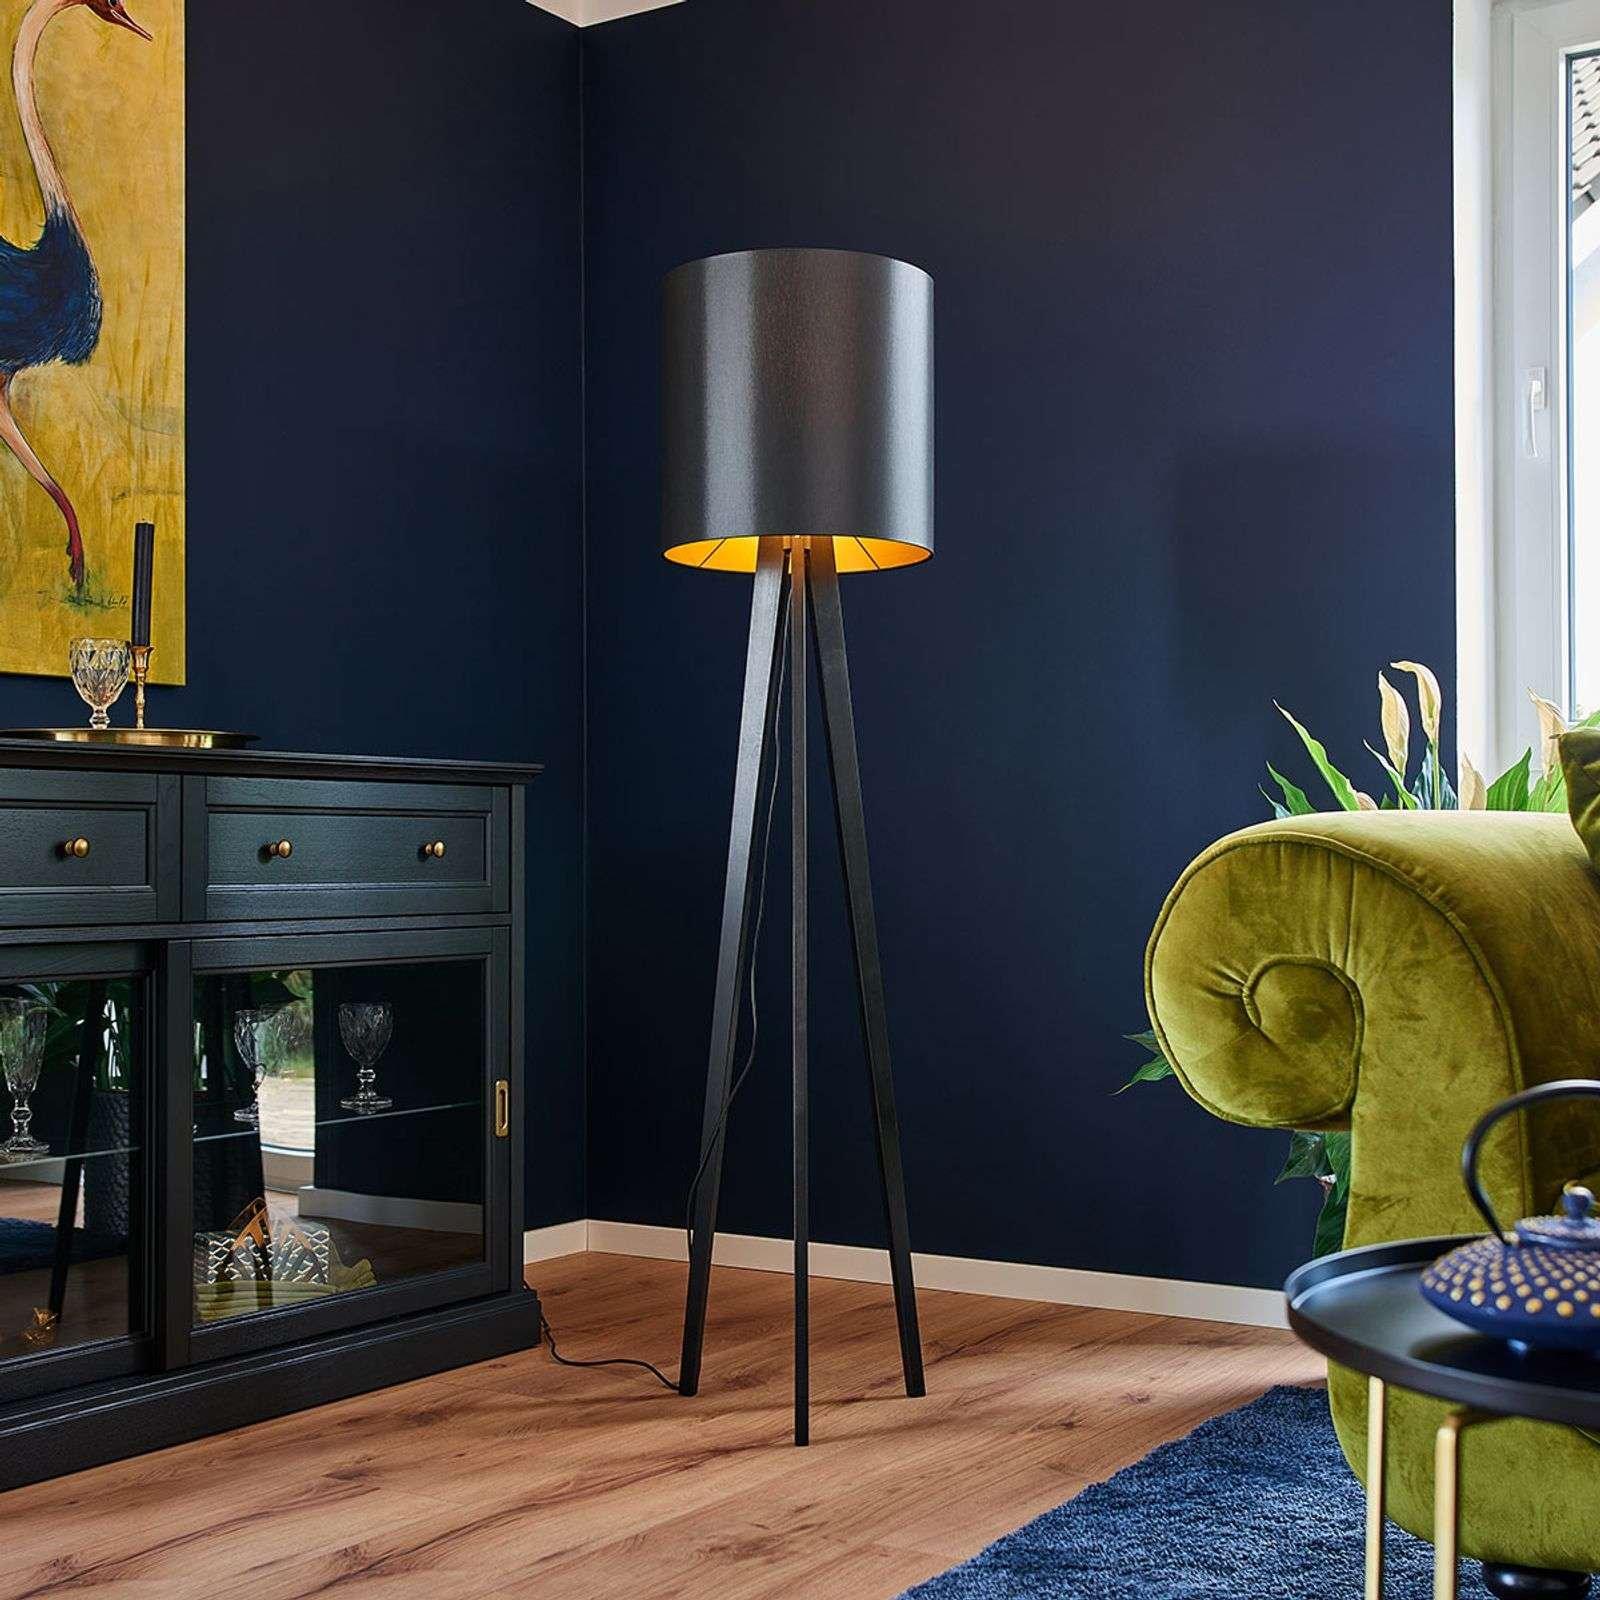 Wooden floor lamp Nida  black gold lampshade